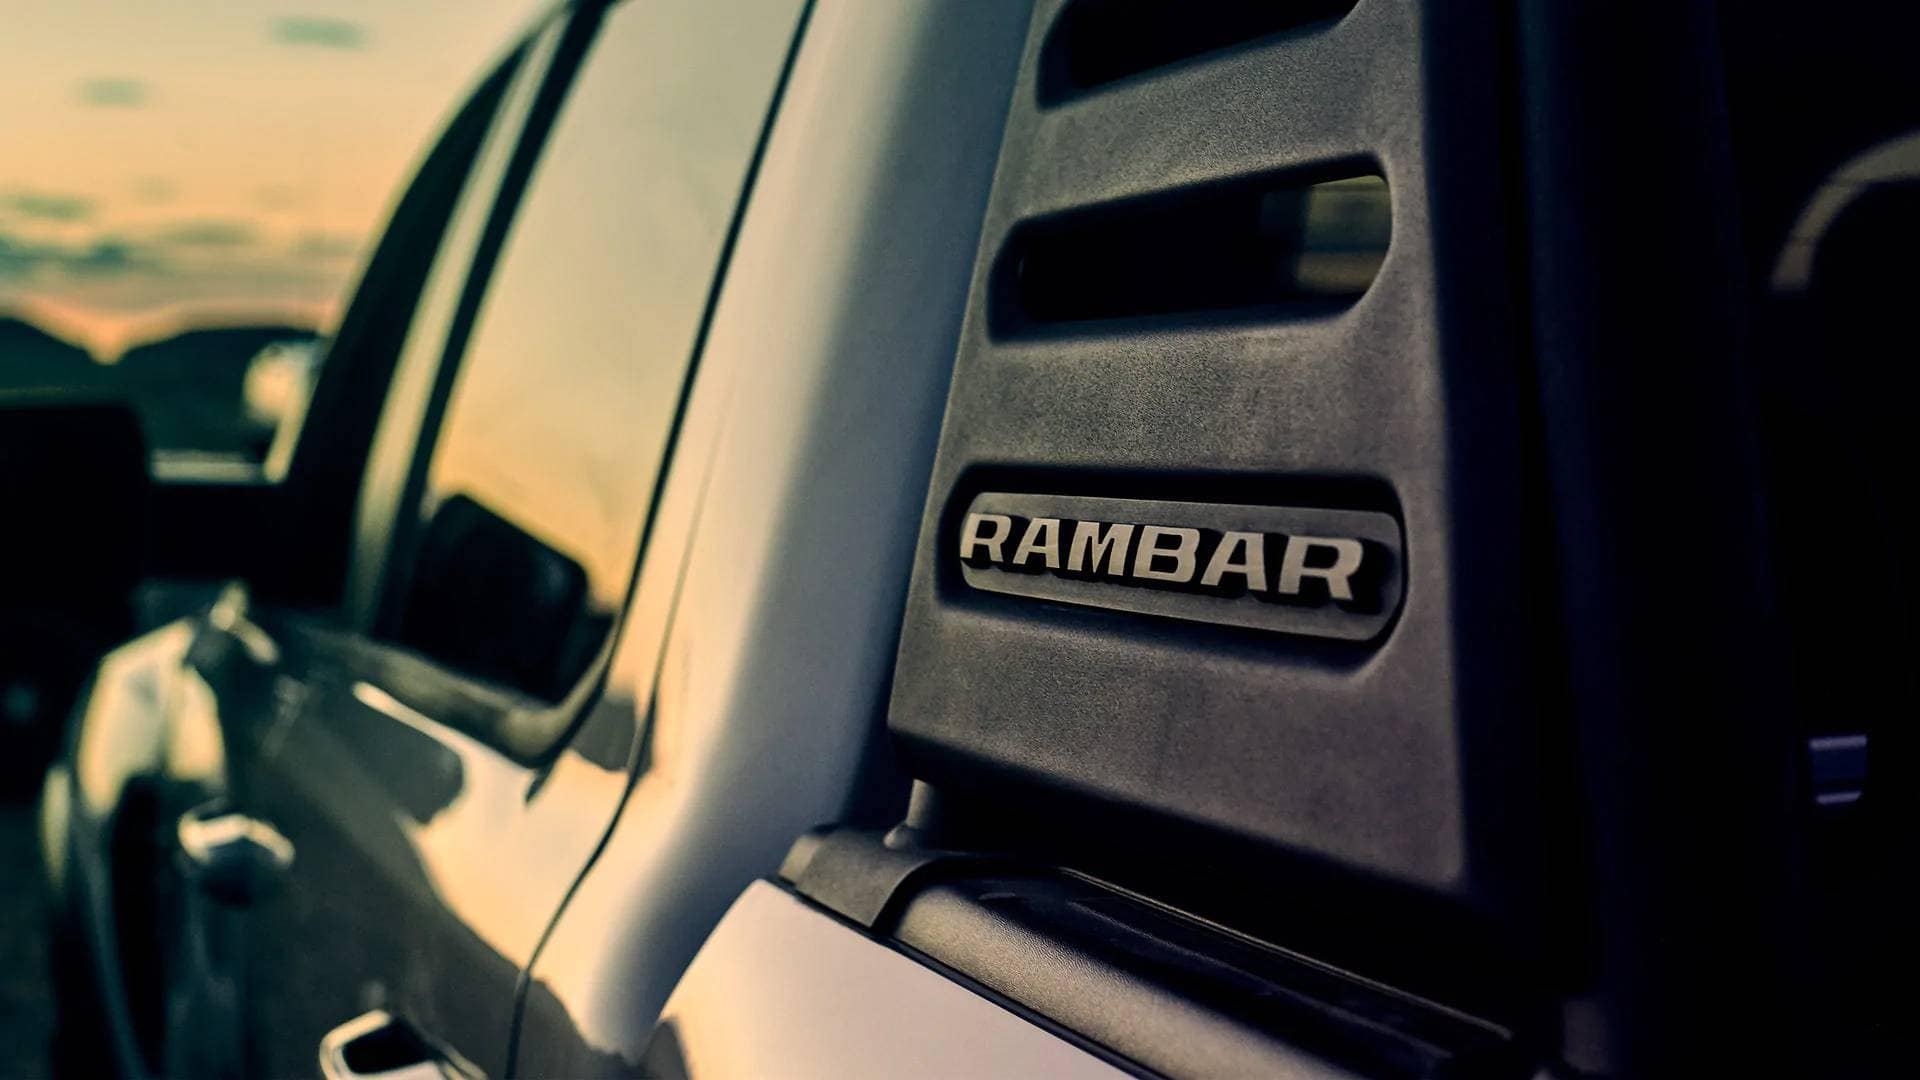 2020 Ram 1500 TRX